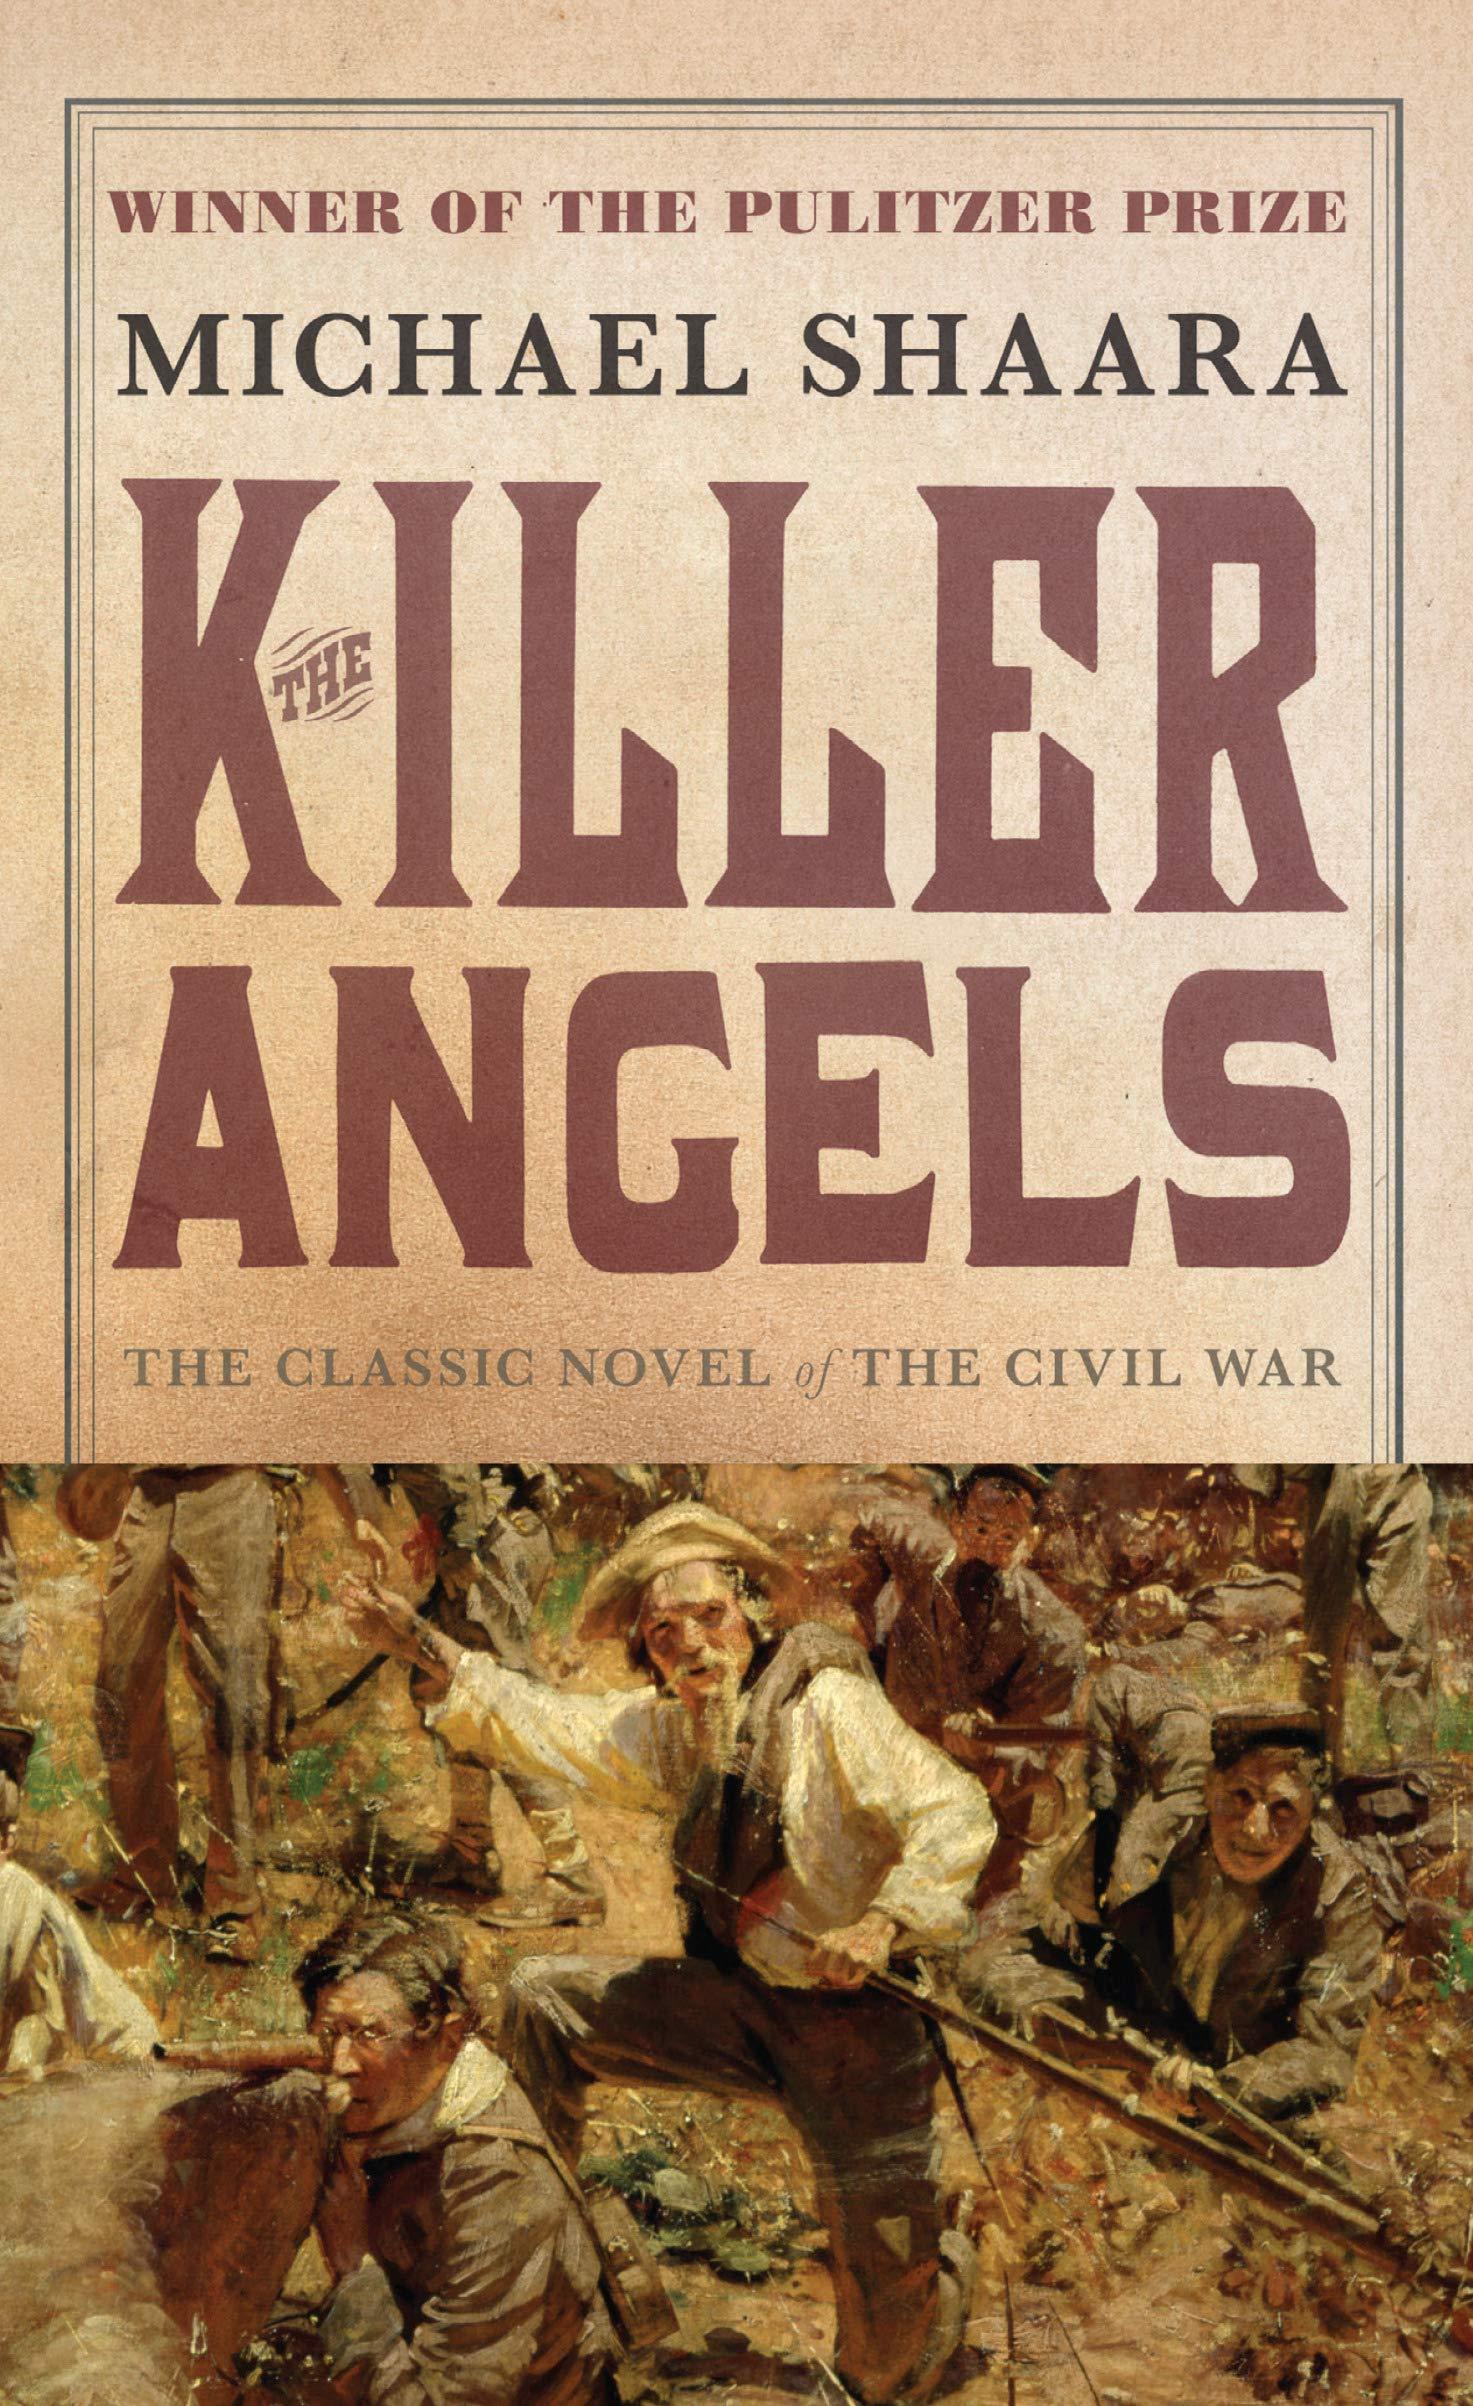 Image result for the killer angels michael shaara